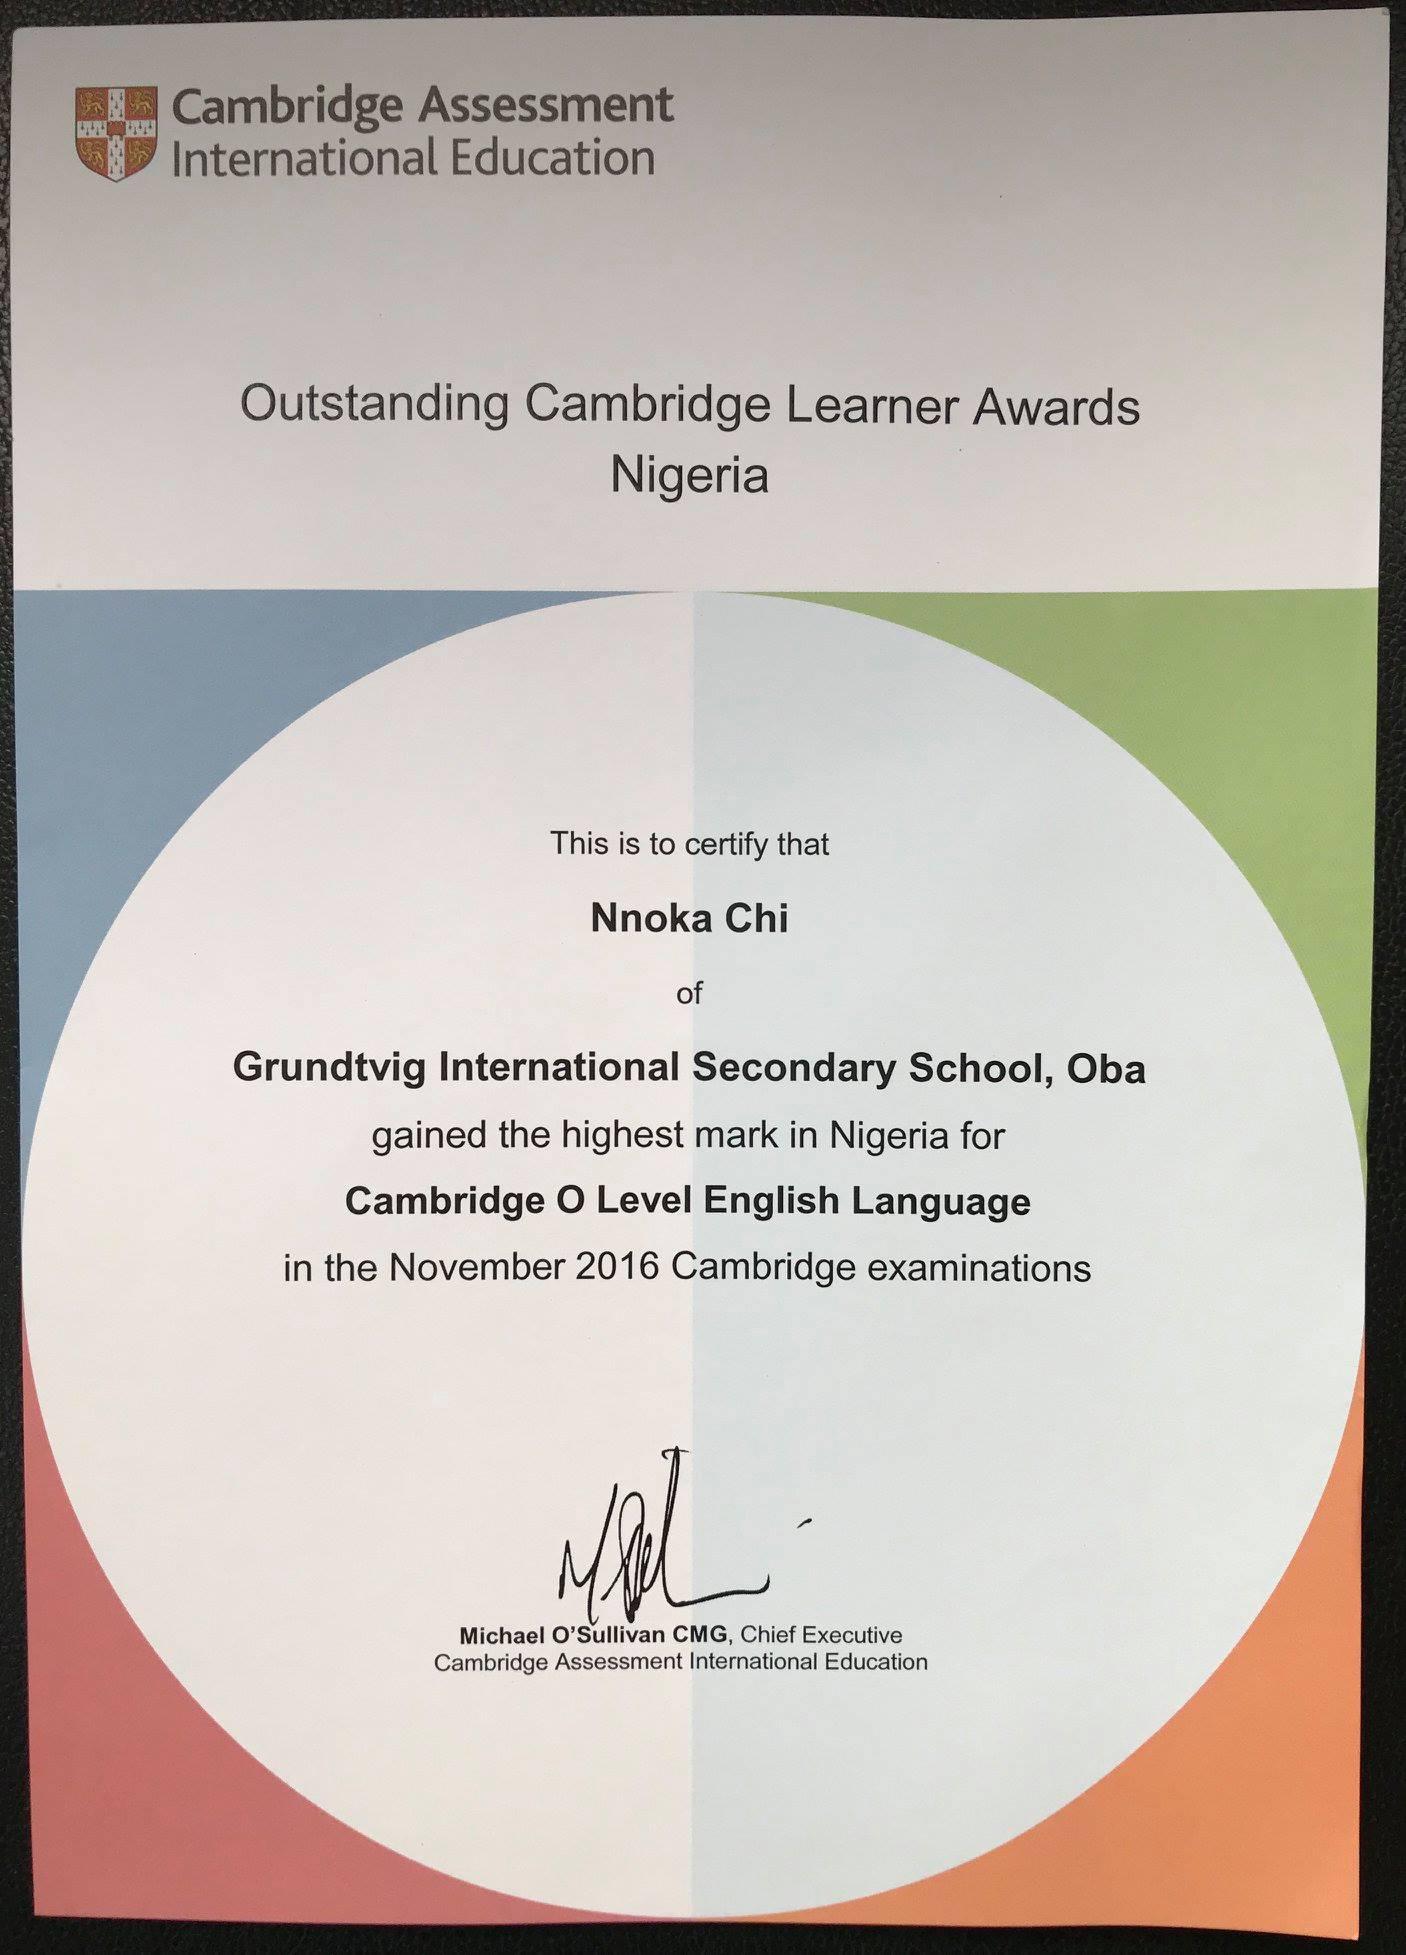 Outstanding Cambridge Learner Awards 2